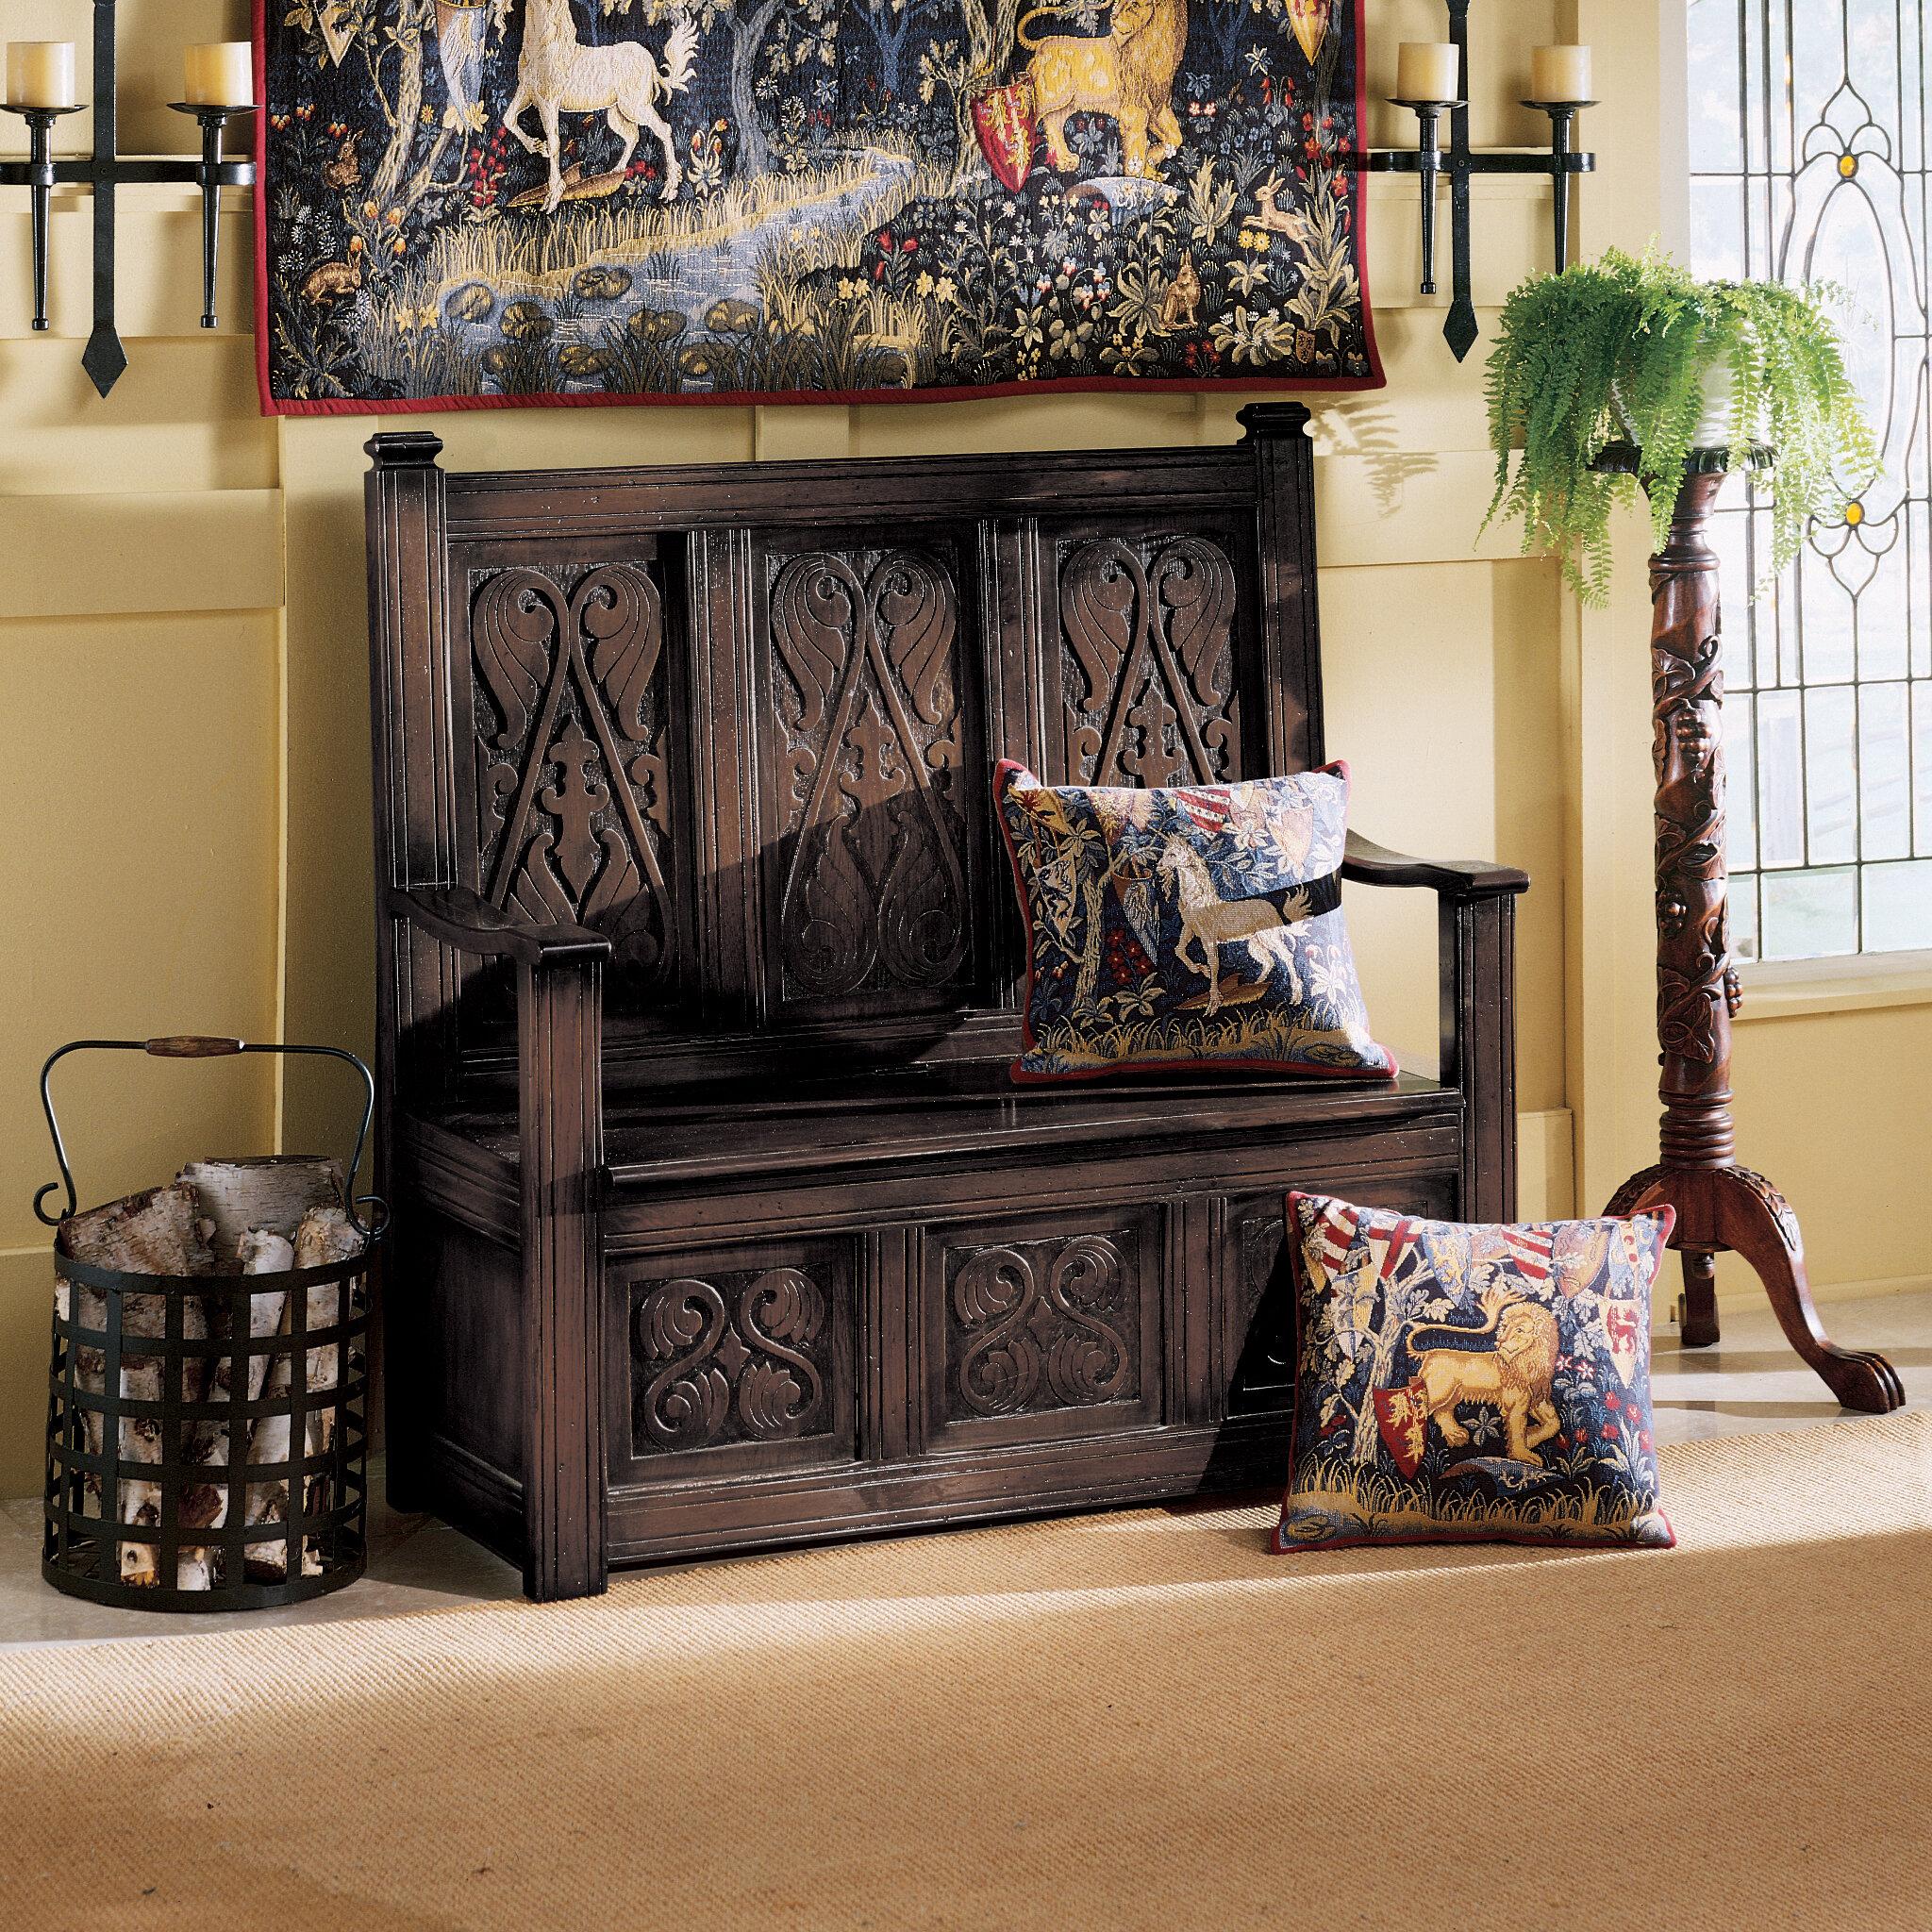 Design Toscano Historic Monk S Wood Storage Bench Reviews Wayfair